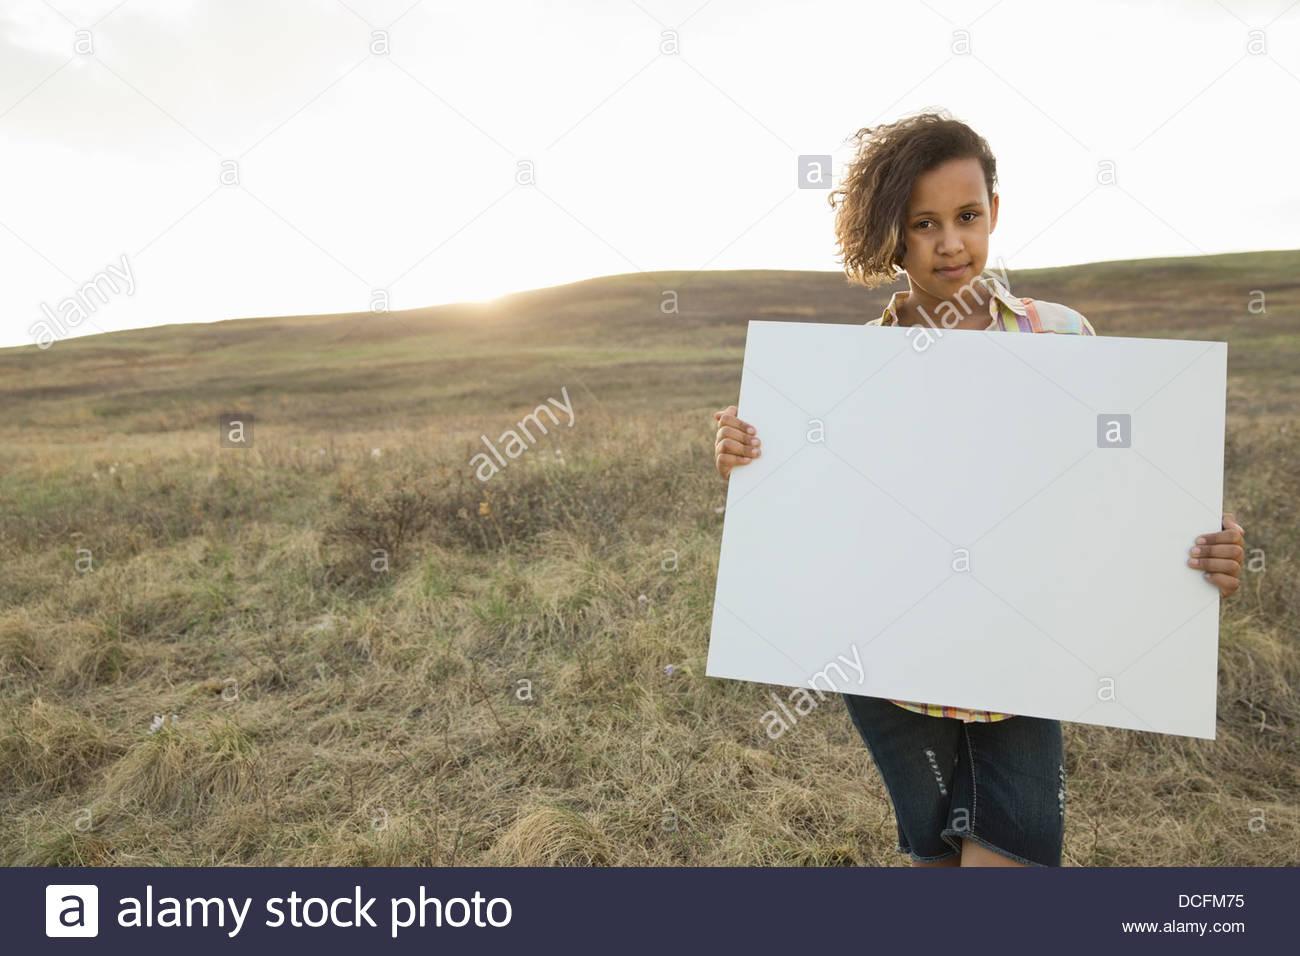 Portrait of girl on hillside holding blank sign board - Stock Image